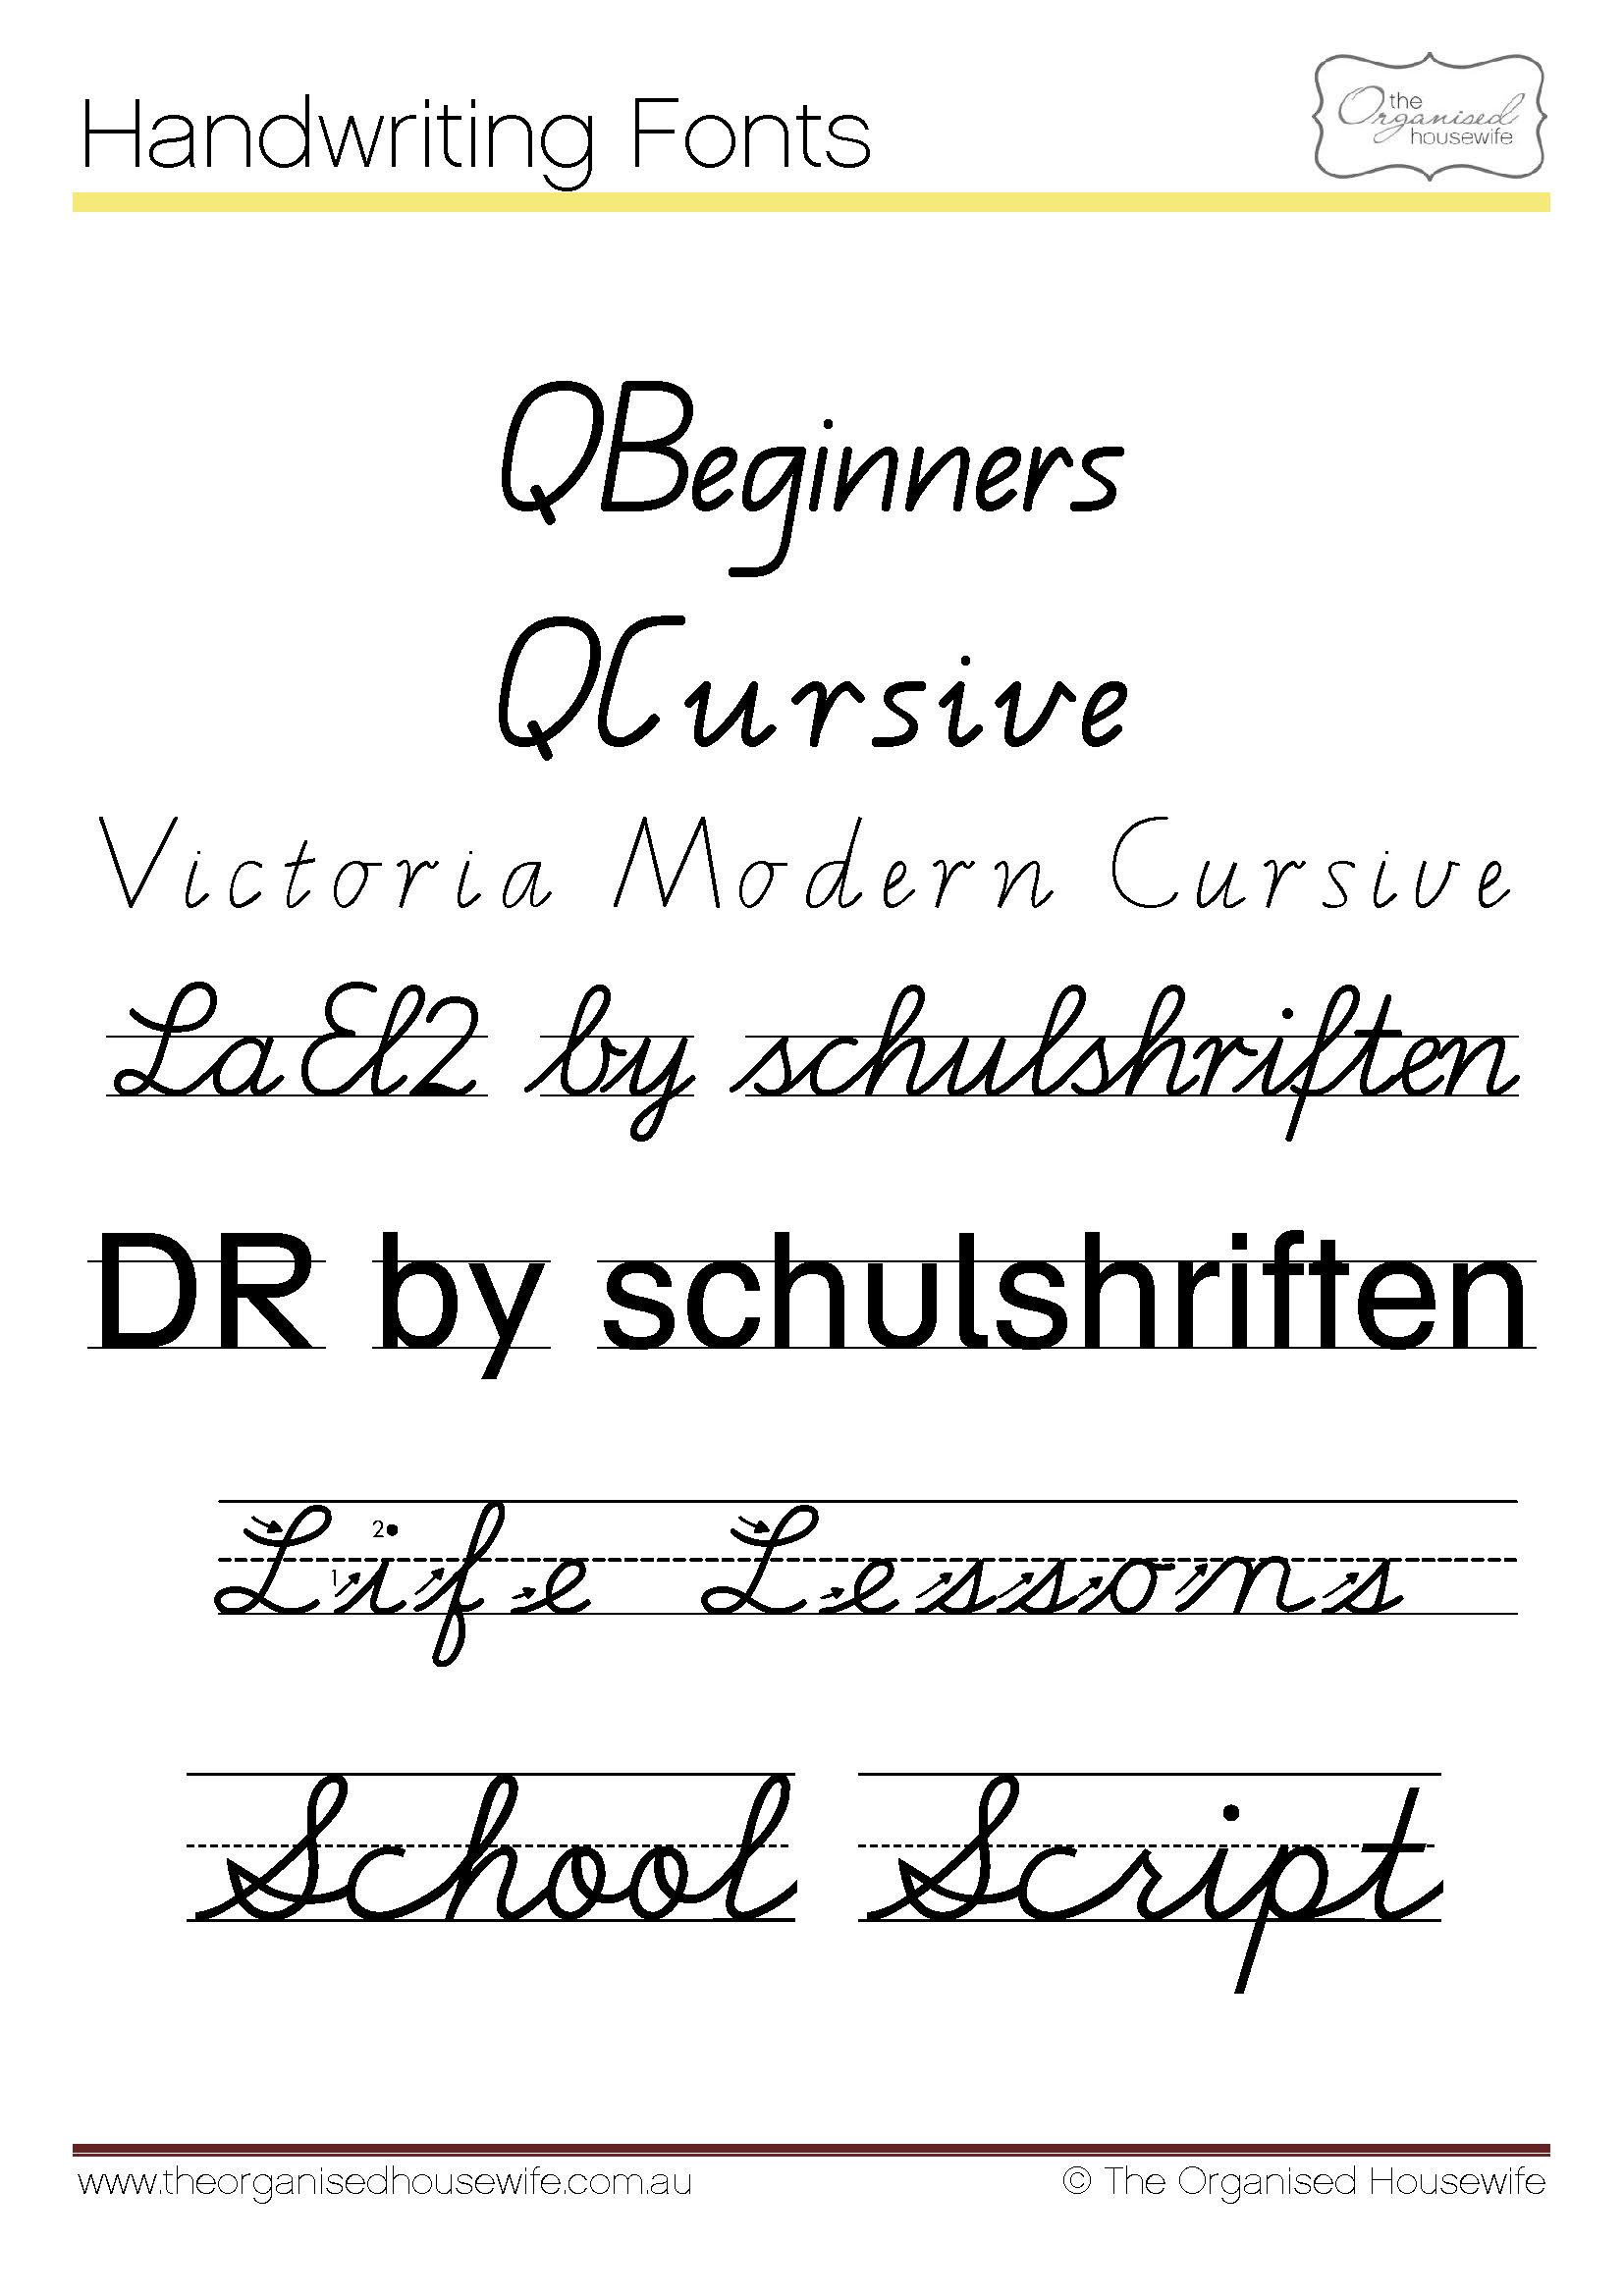 TracingLettersWorksheets.com